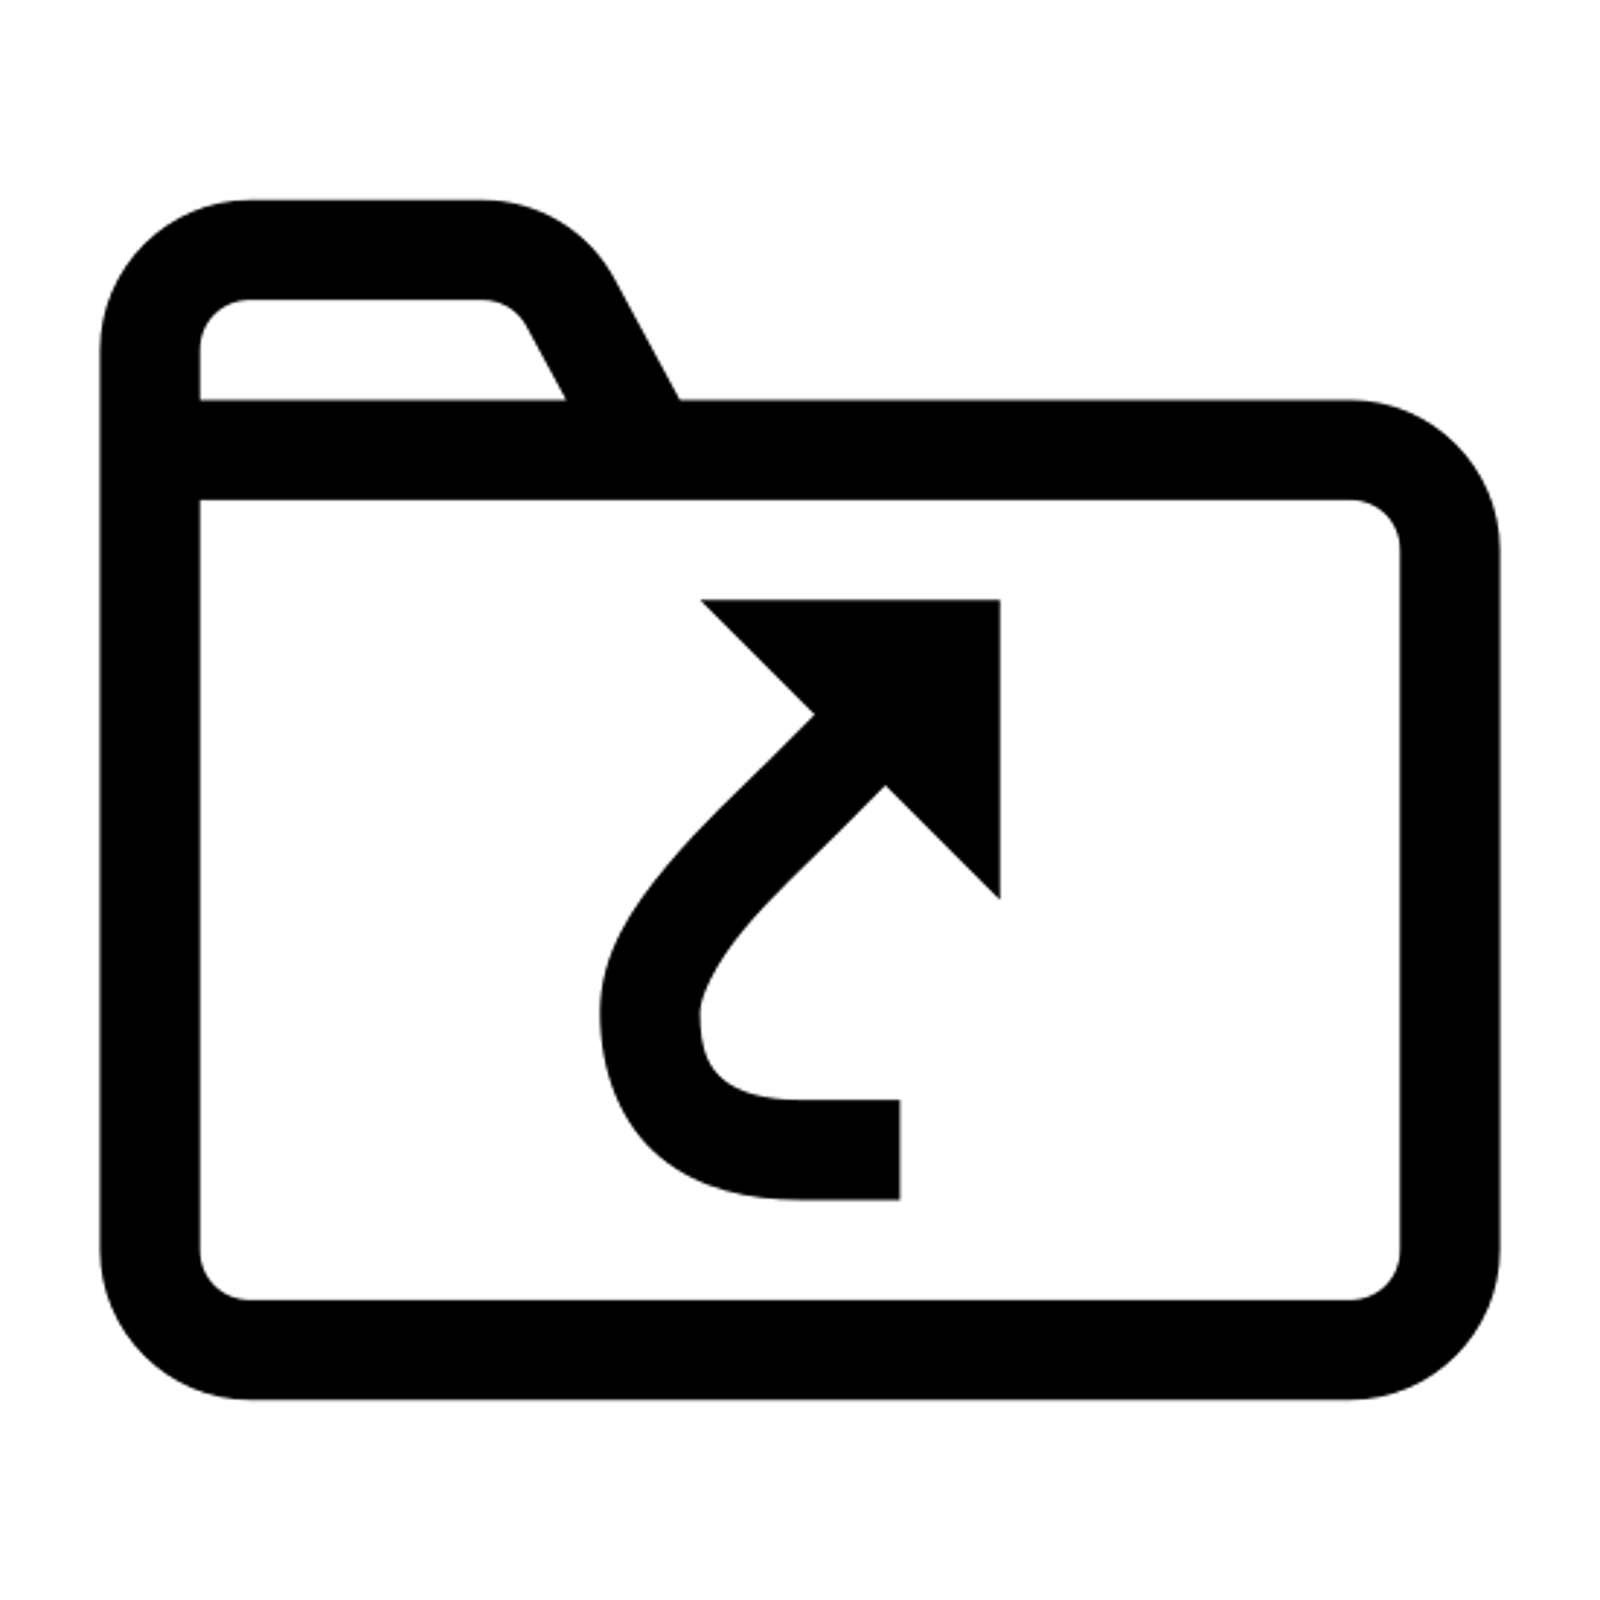 katalog Symlink icon